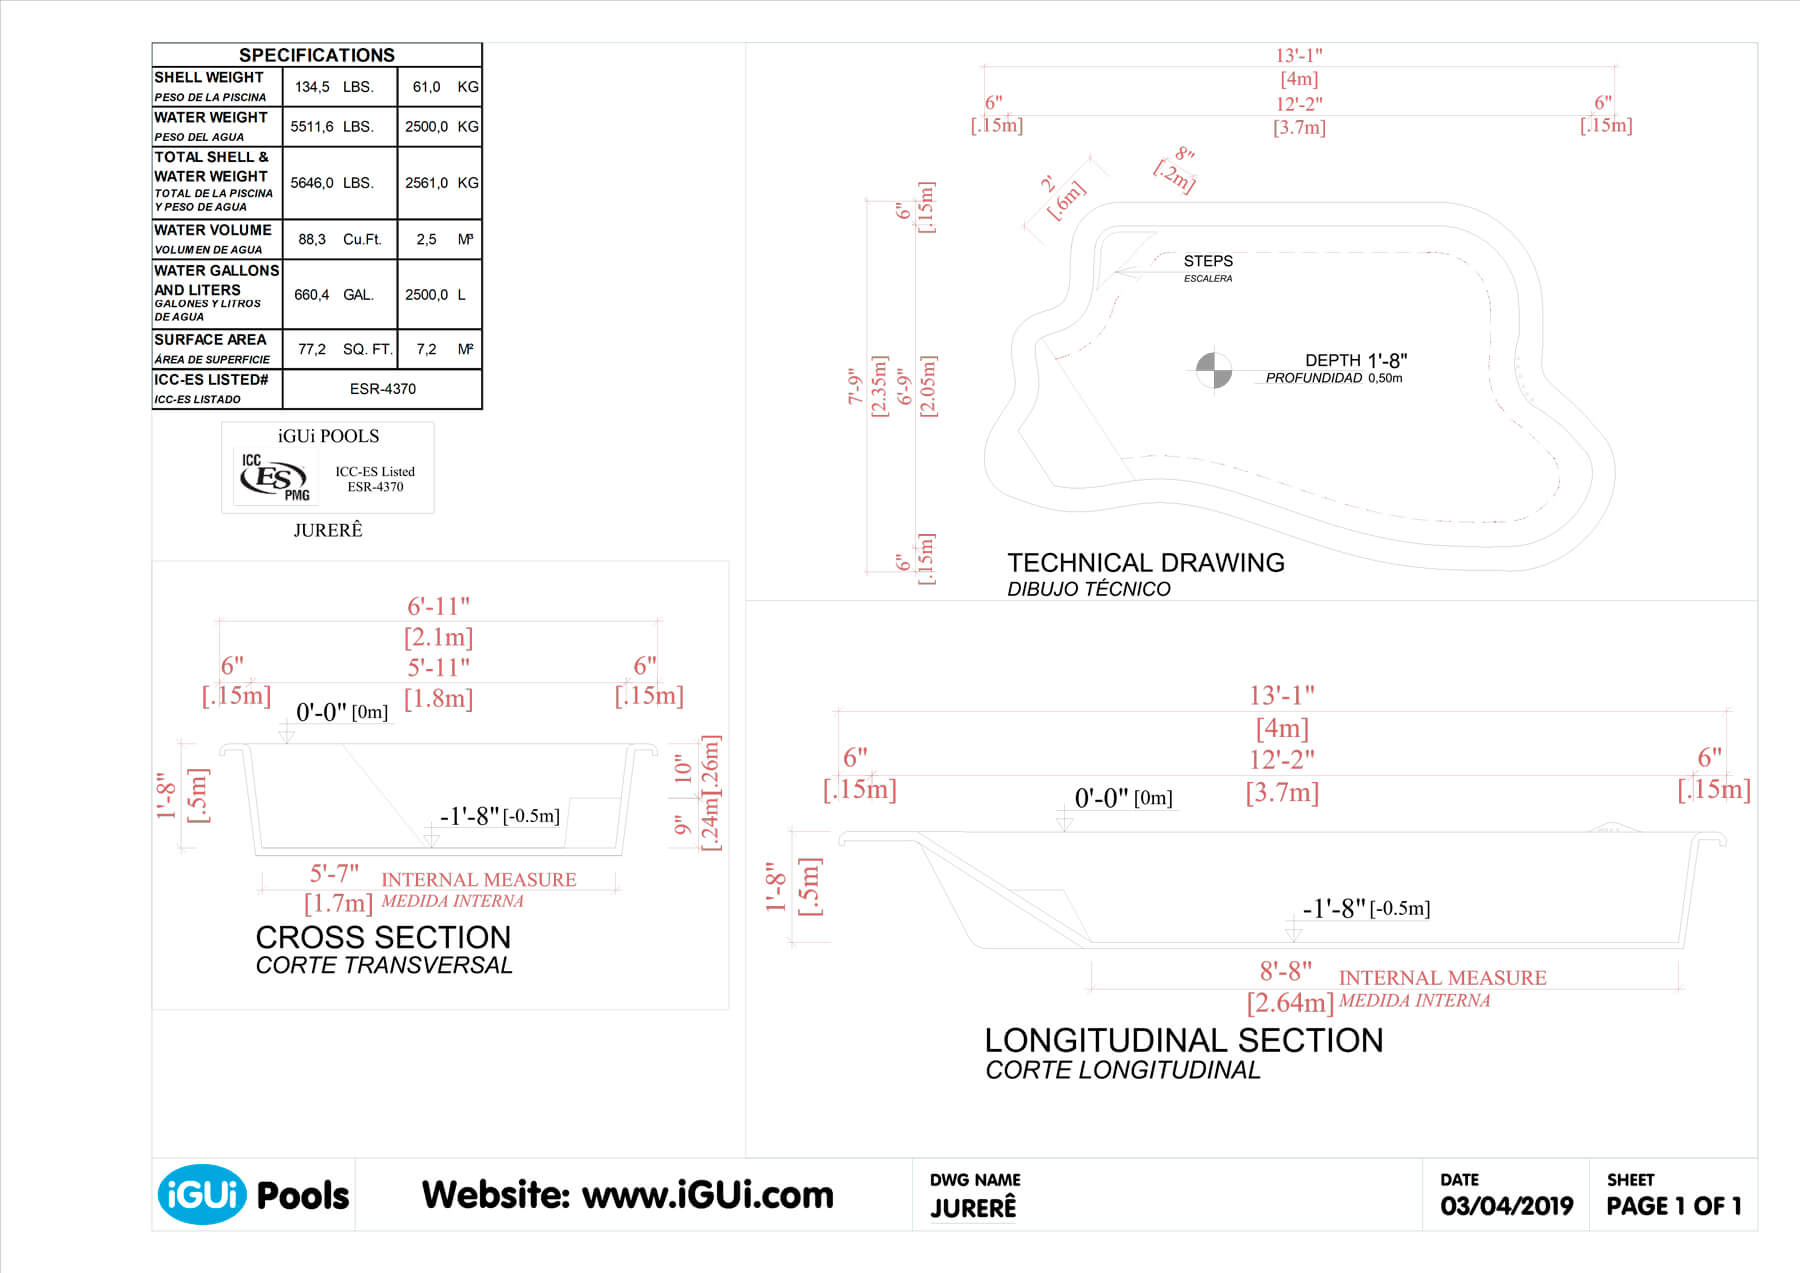 Technical drawing Jurerê (no scale)